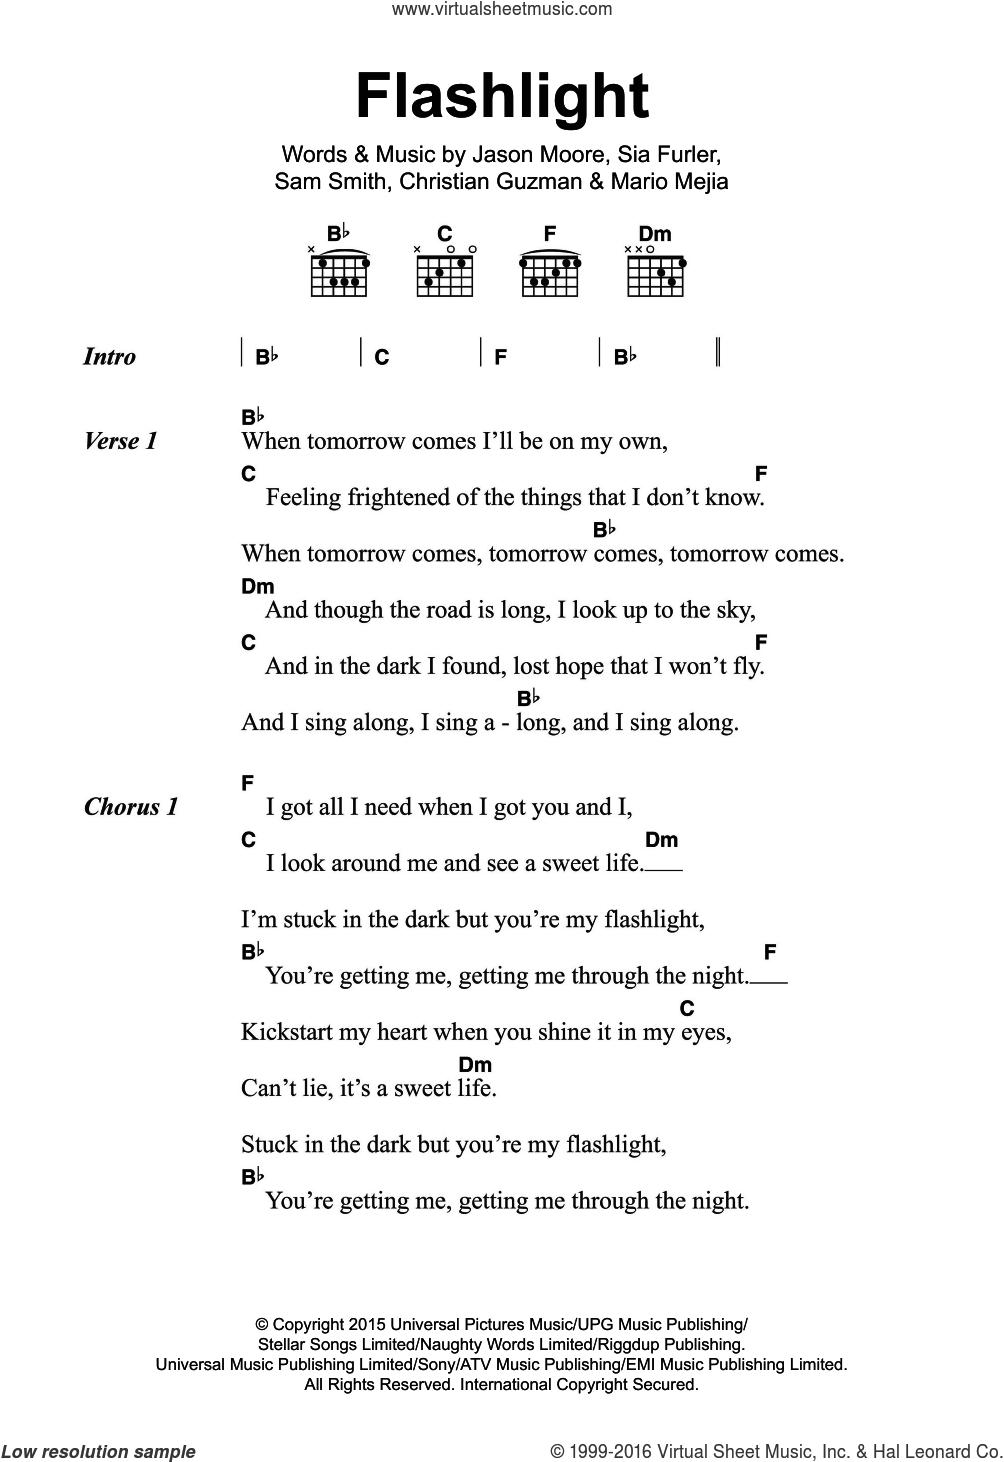 J Flashlight Sheet Music For Guitar Chords Pdf